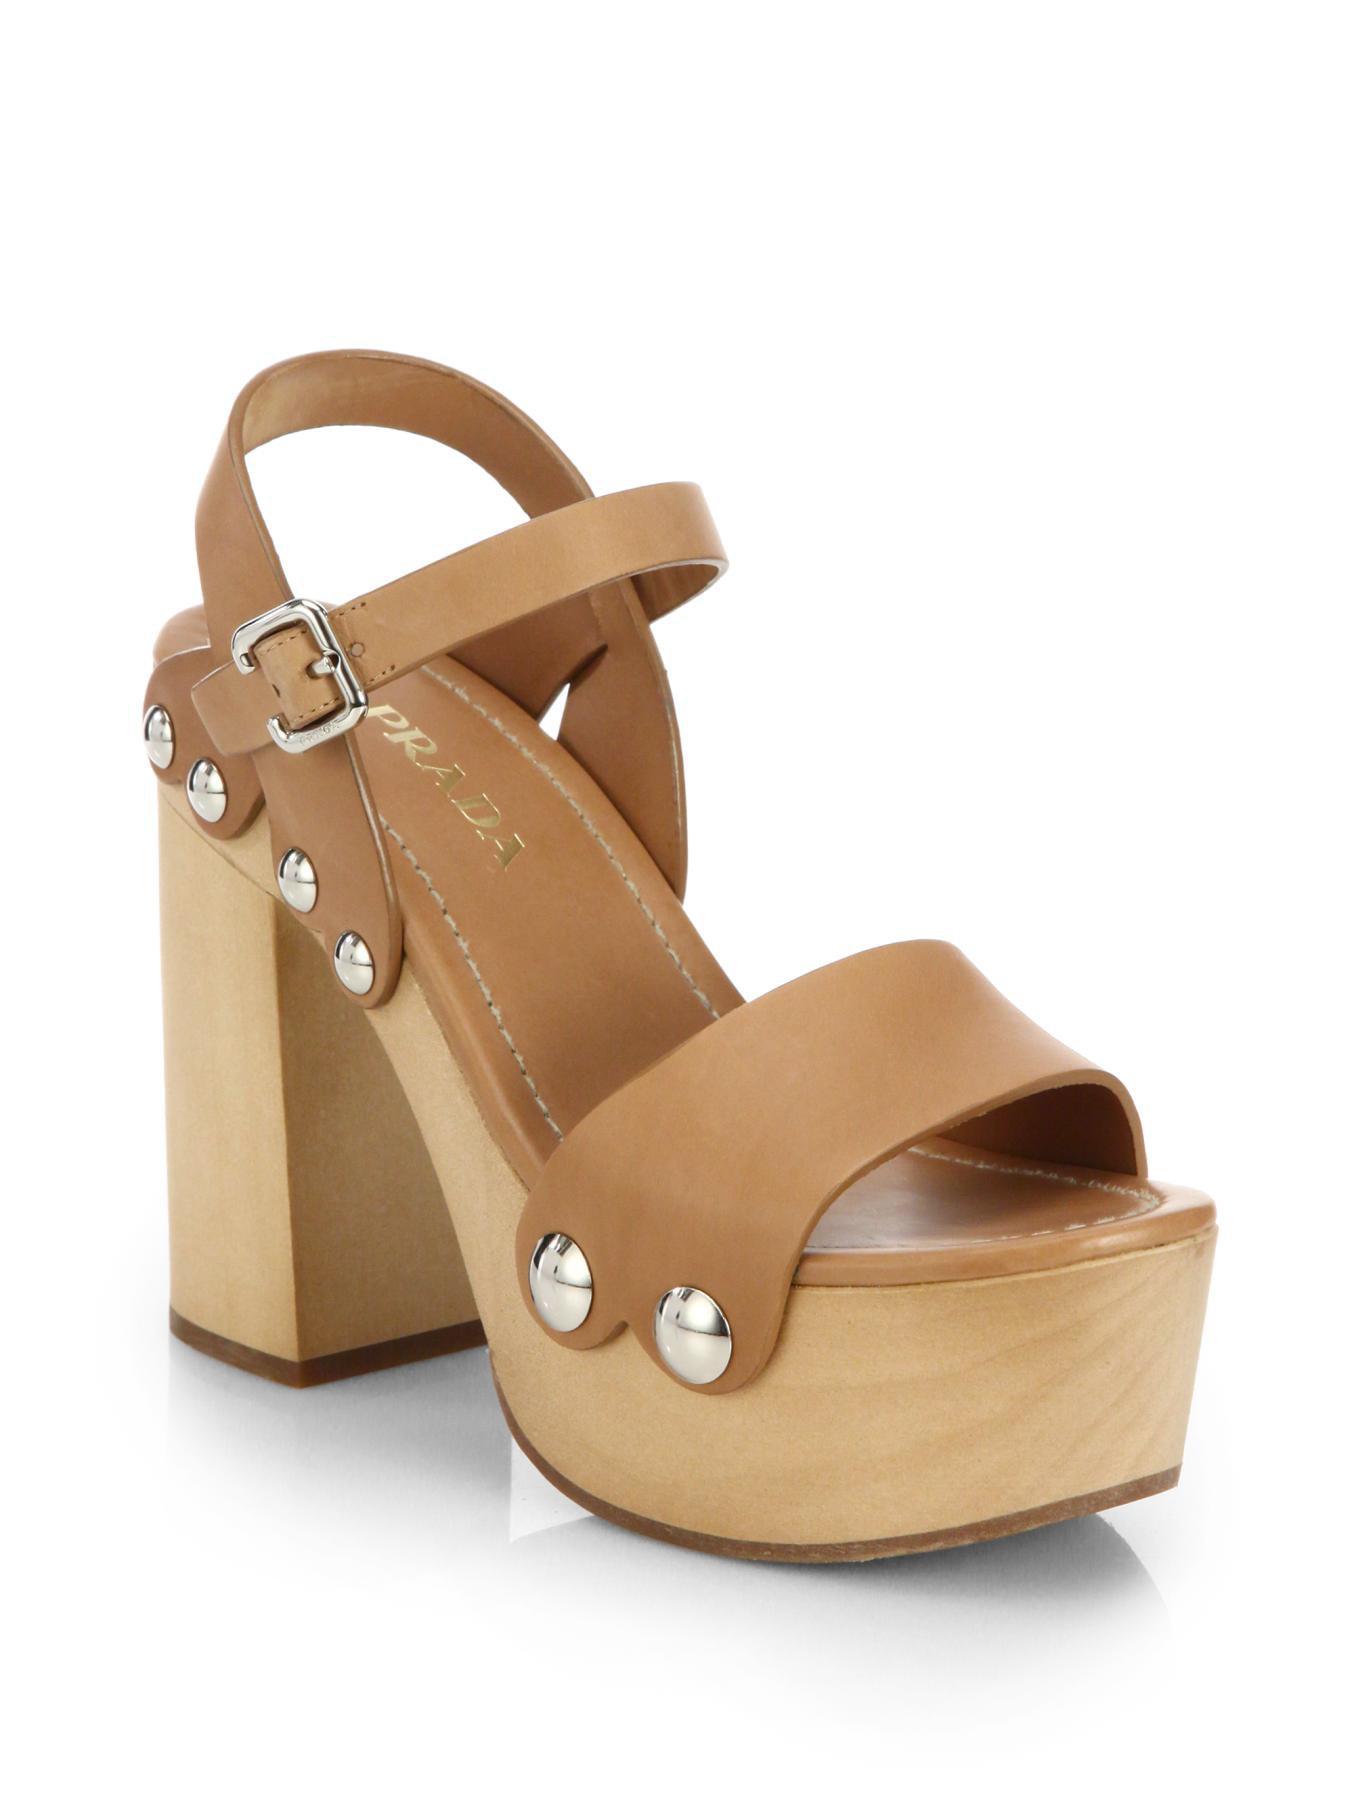 020910cadb9 Lyst - Prada Wooden-heel Leather Platform Sandals in Brown